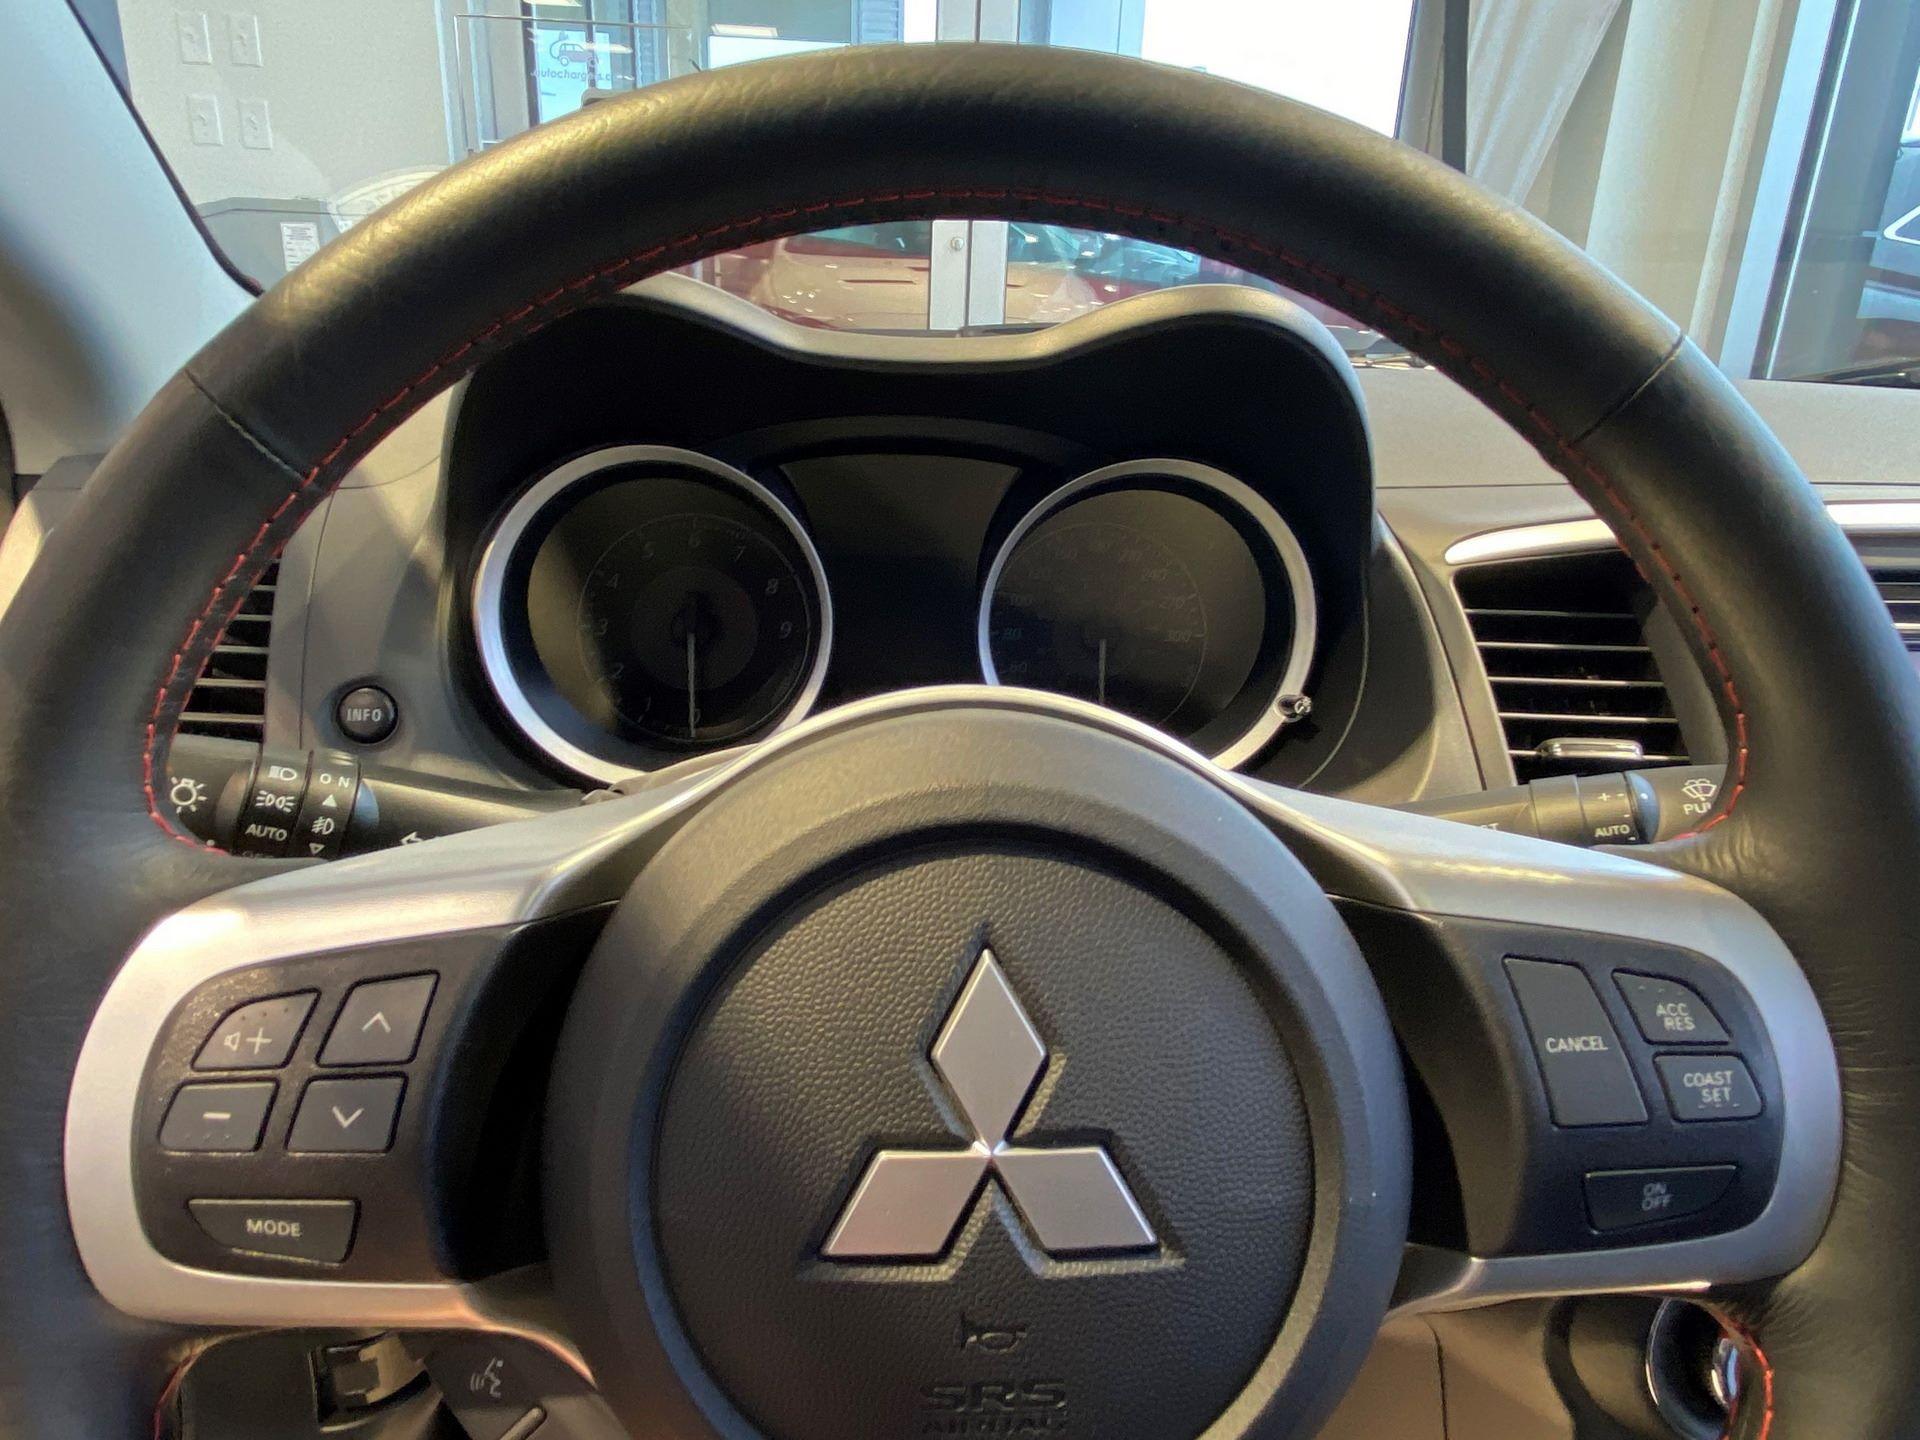 Mitsubishi-Lancer-Evo-Final-Edition-for-sale-16